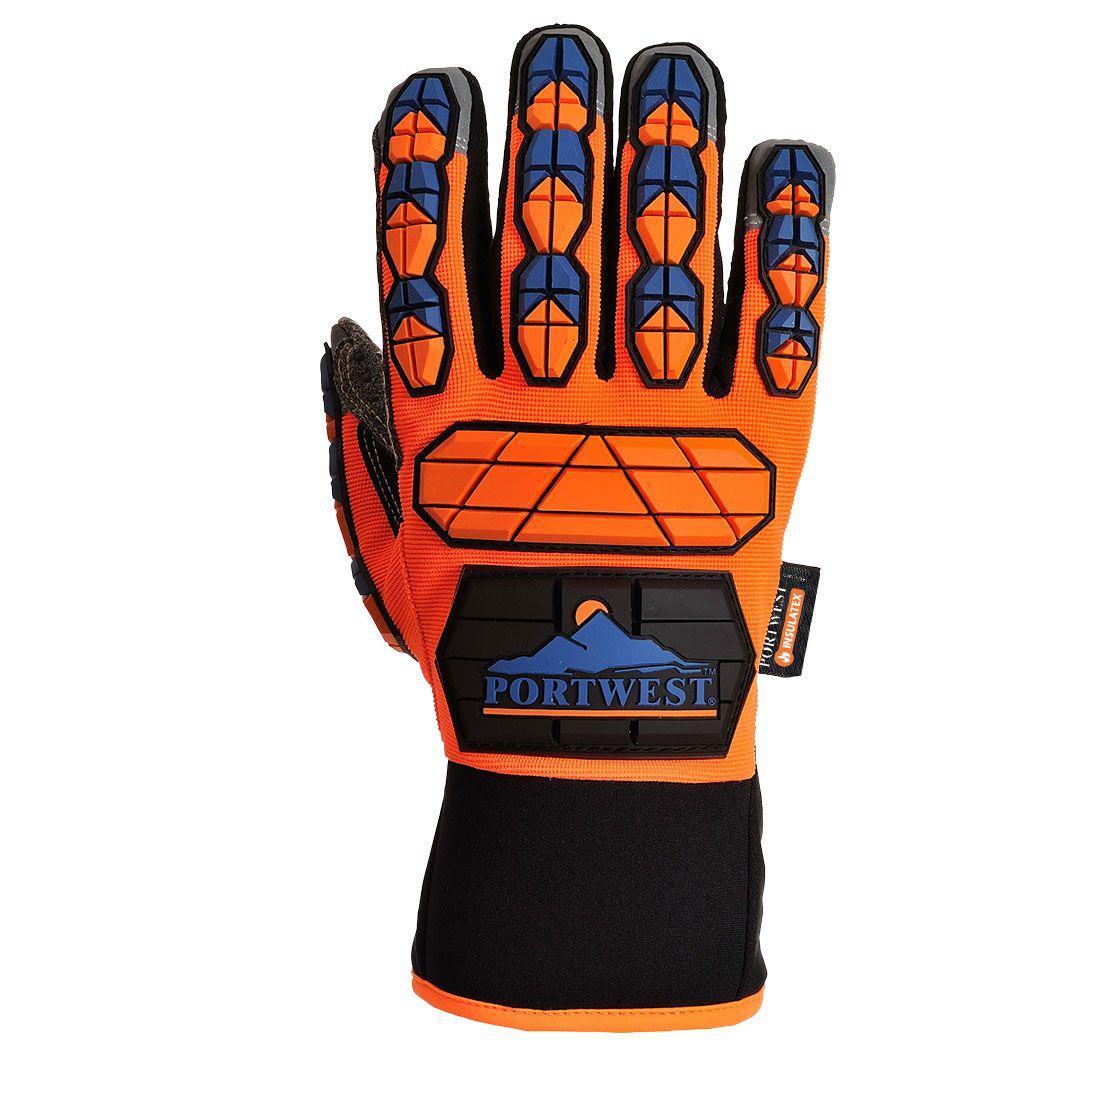 Portwest Handschoenen A726 oranje-blauw(O4)